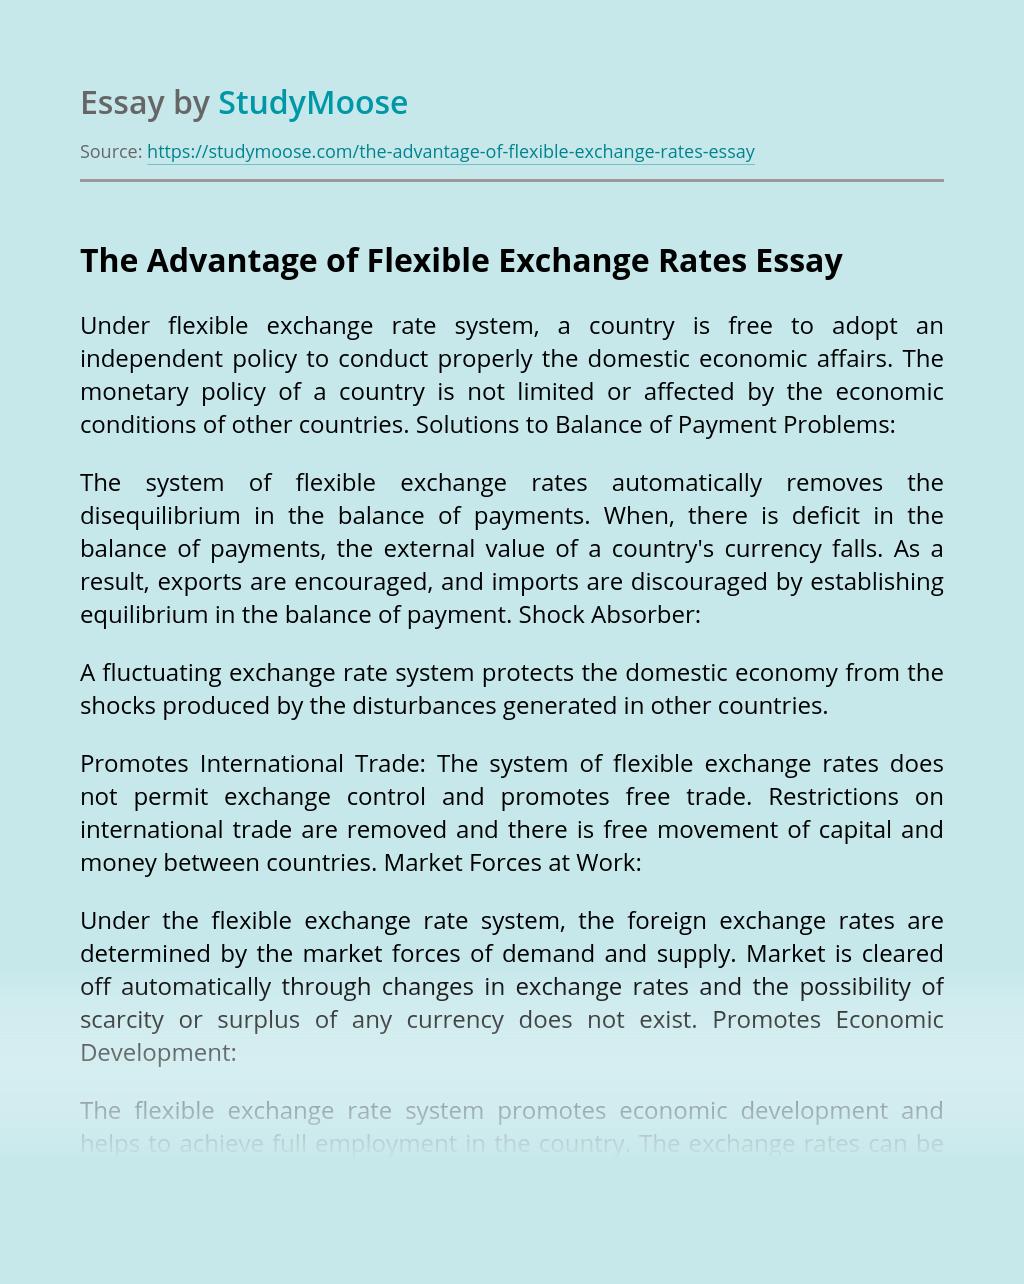 The Advantage of Flexible Exchange Rates